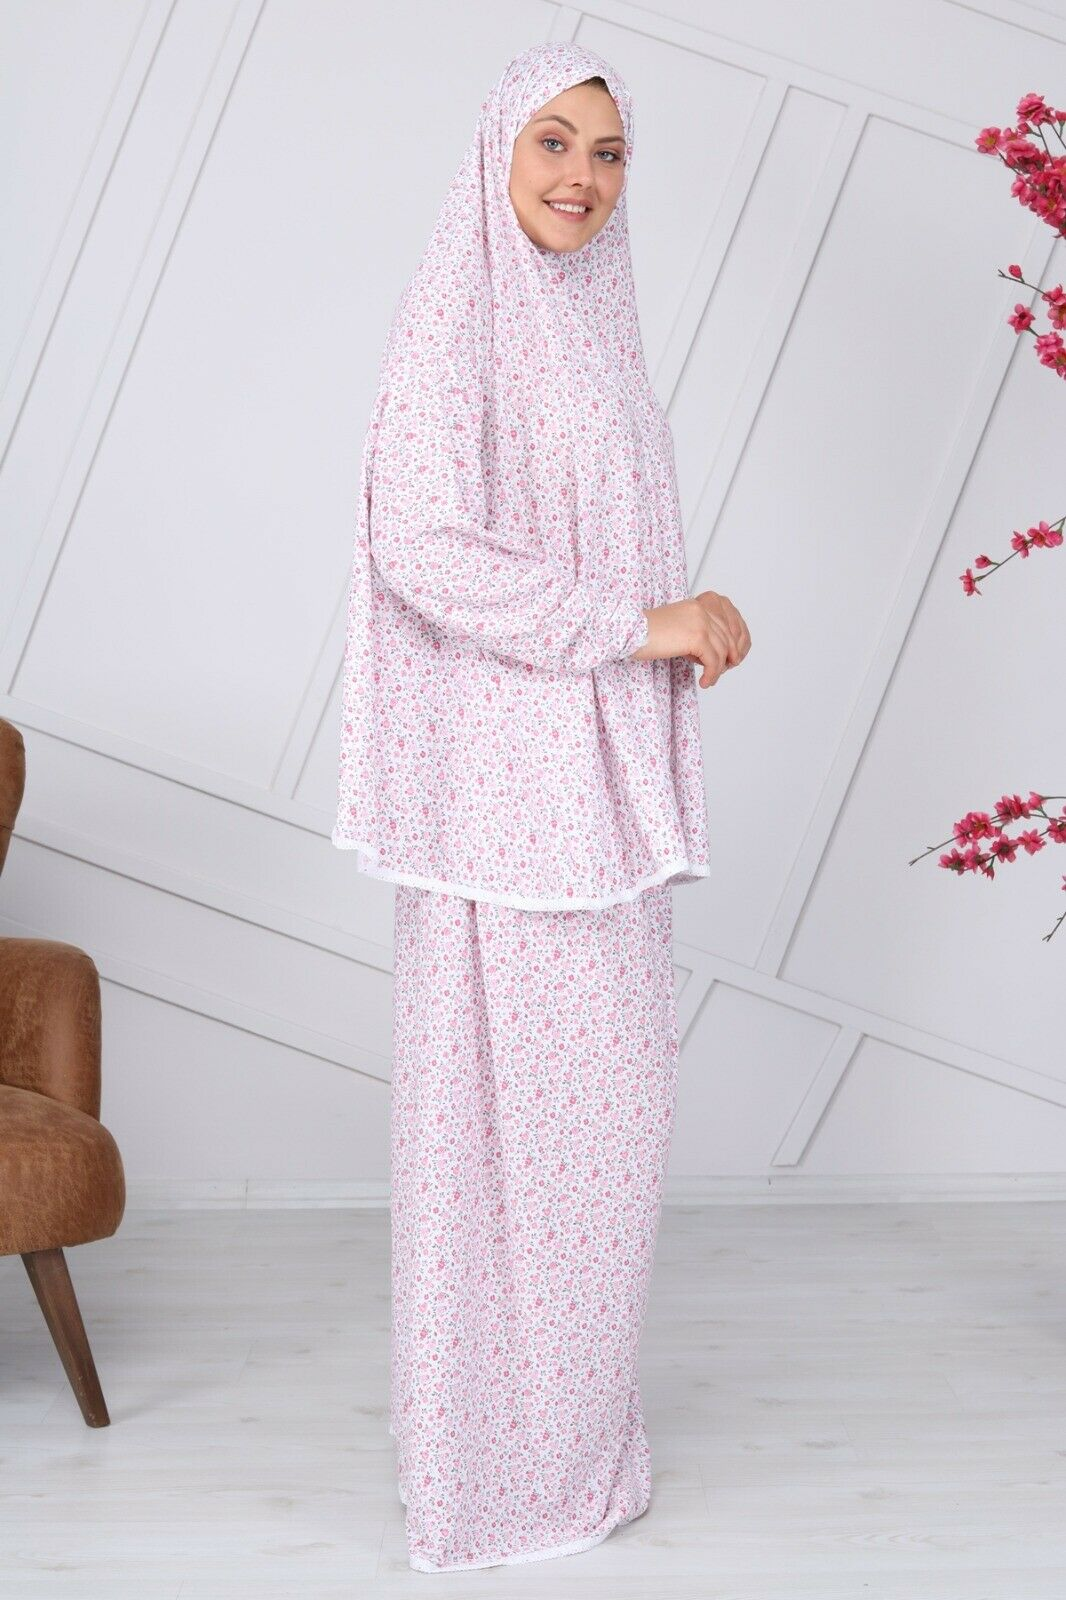 2pc Yusra Muslim Women kidz Prayer Dress w sleeve Scarf Hijab Cover Body RRP